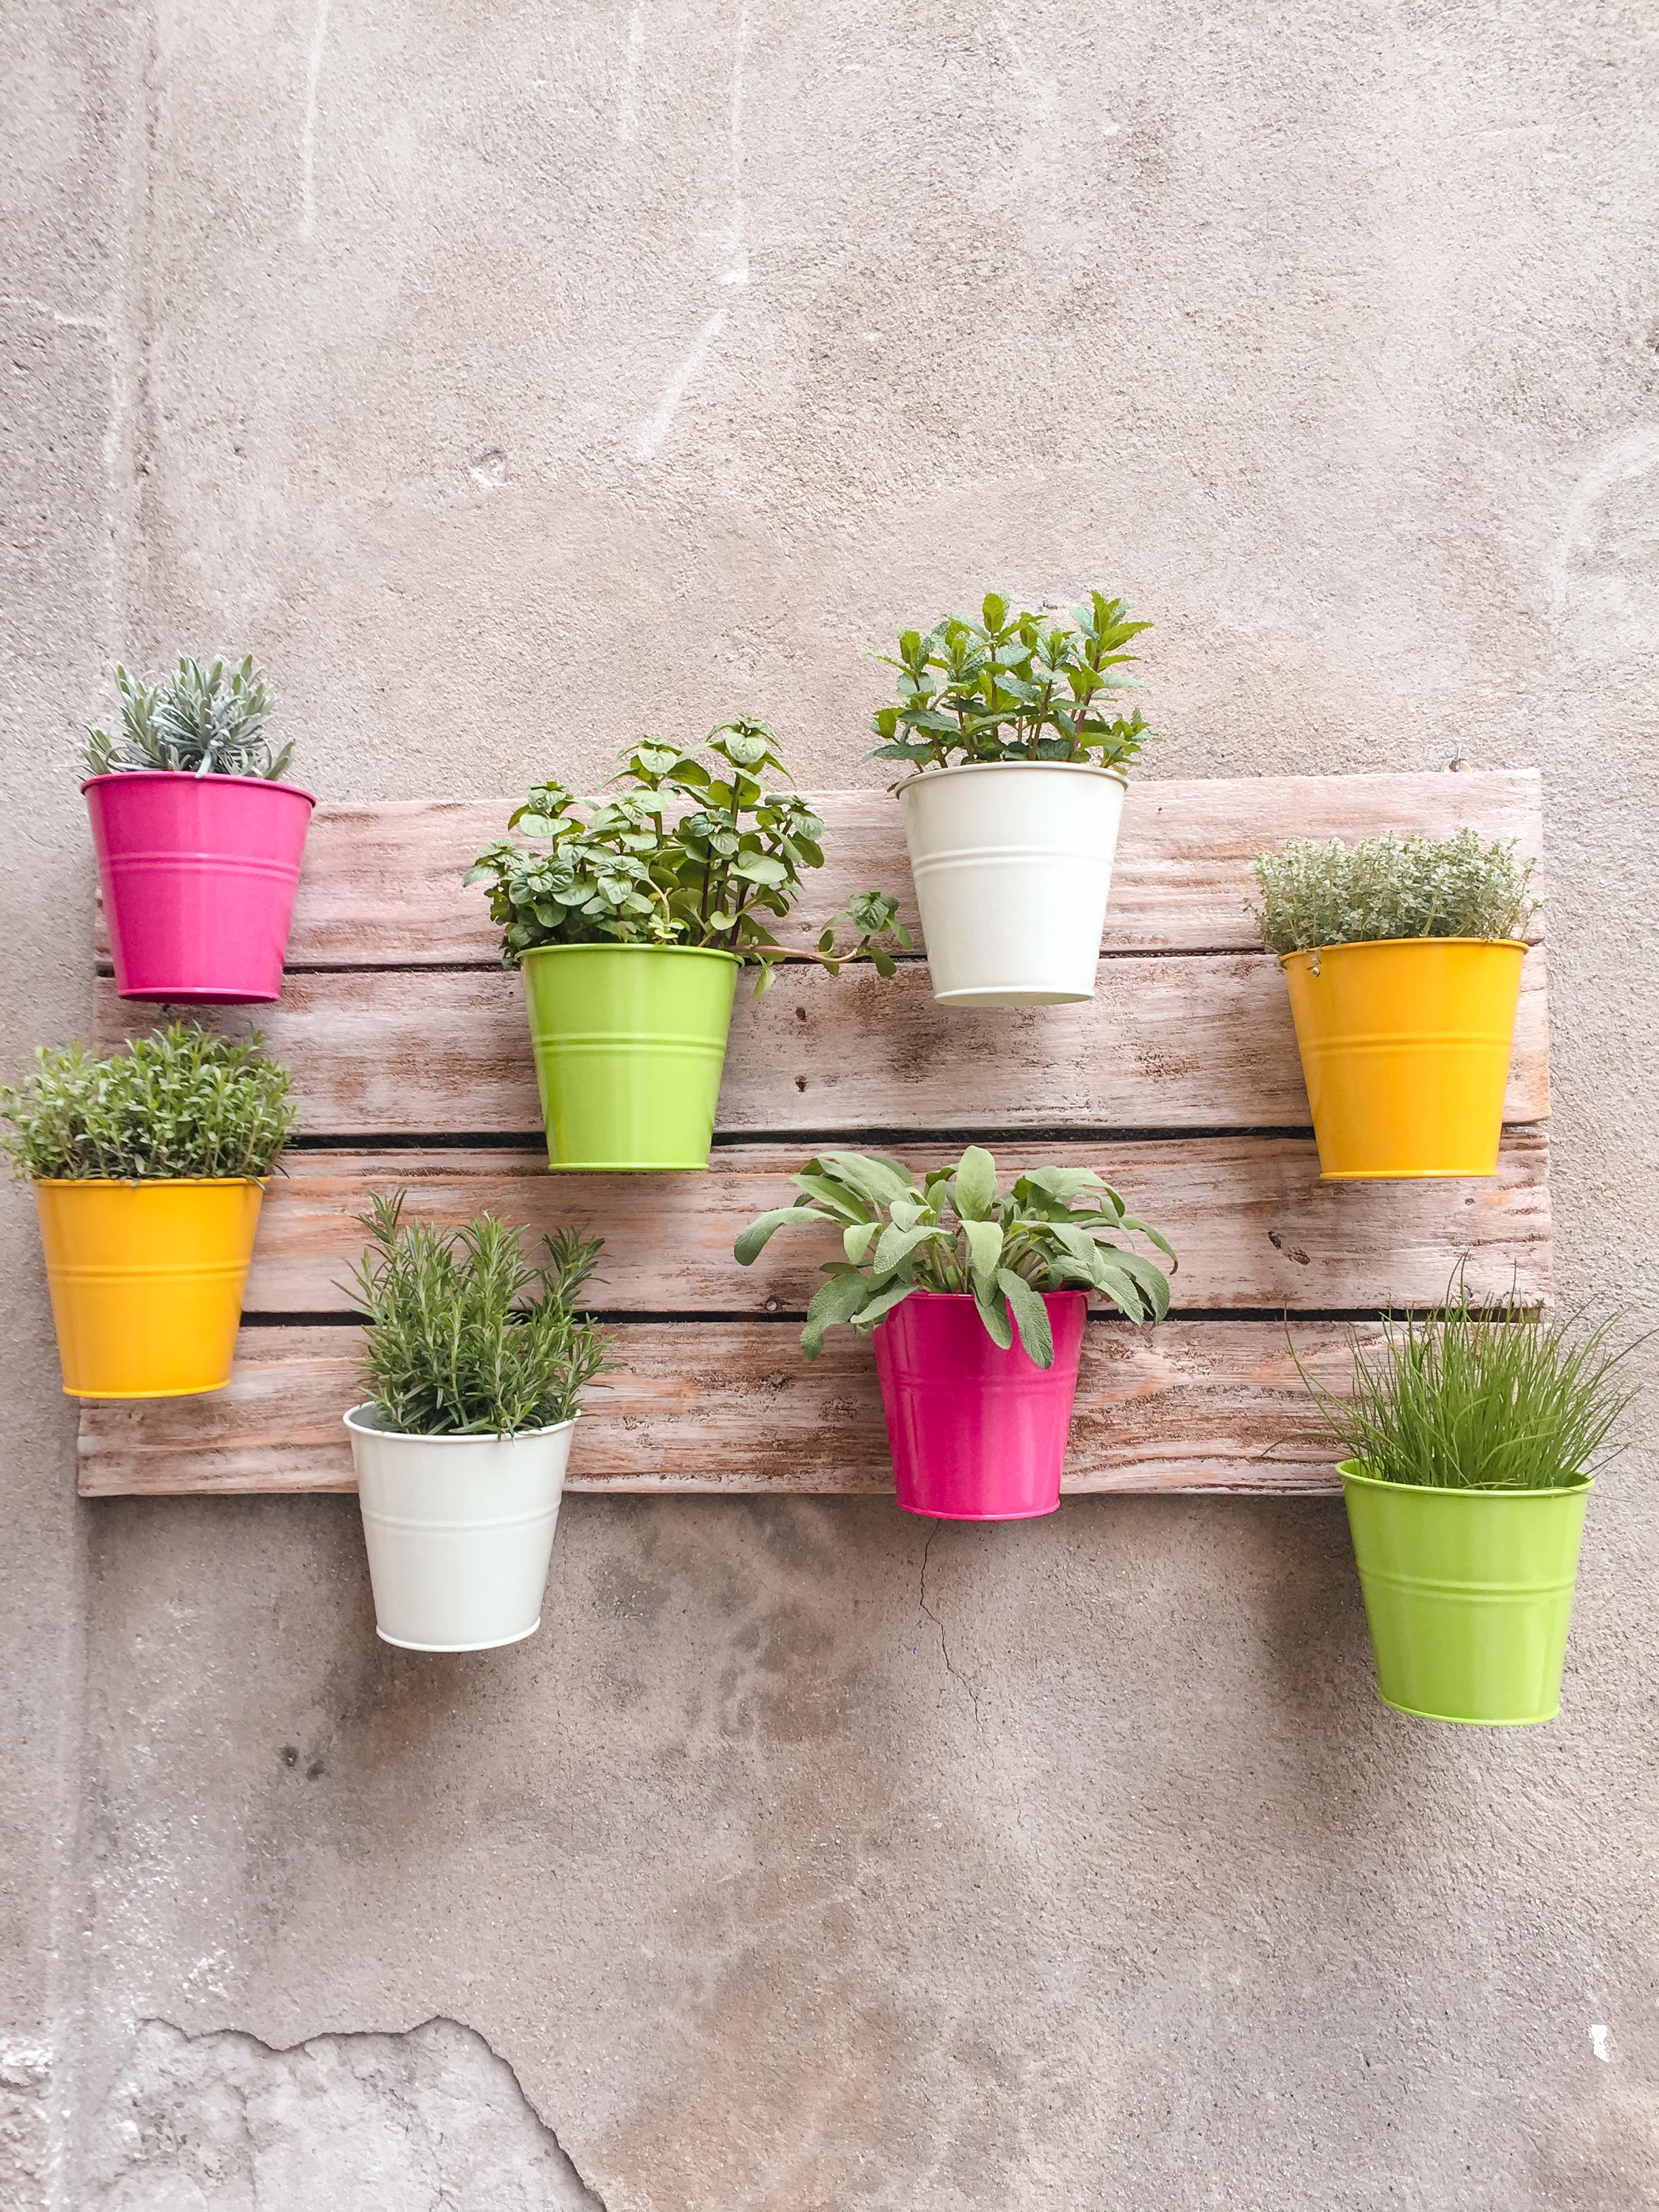 March | Gardener's Almanac | Gardener's Tips | Gardening Tips | Yard Care | Garden Care | Things To Do In March | Gardening In March